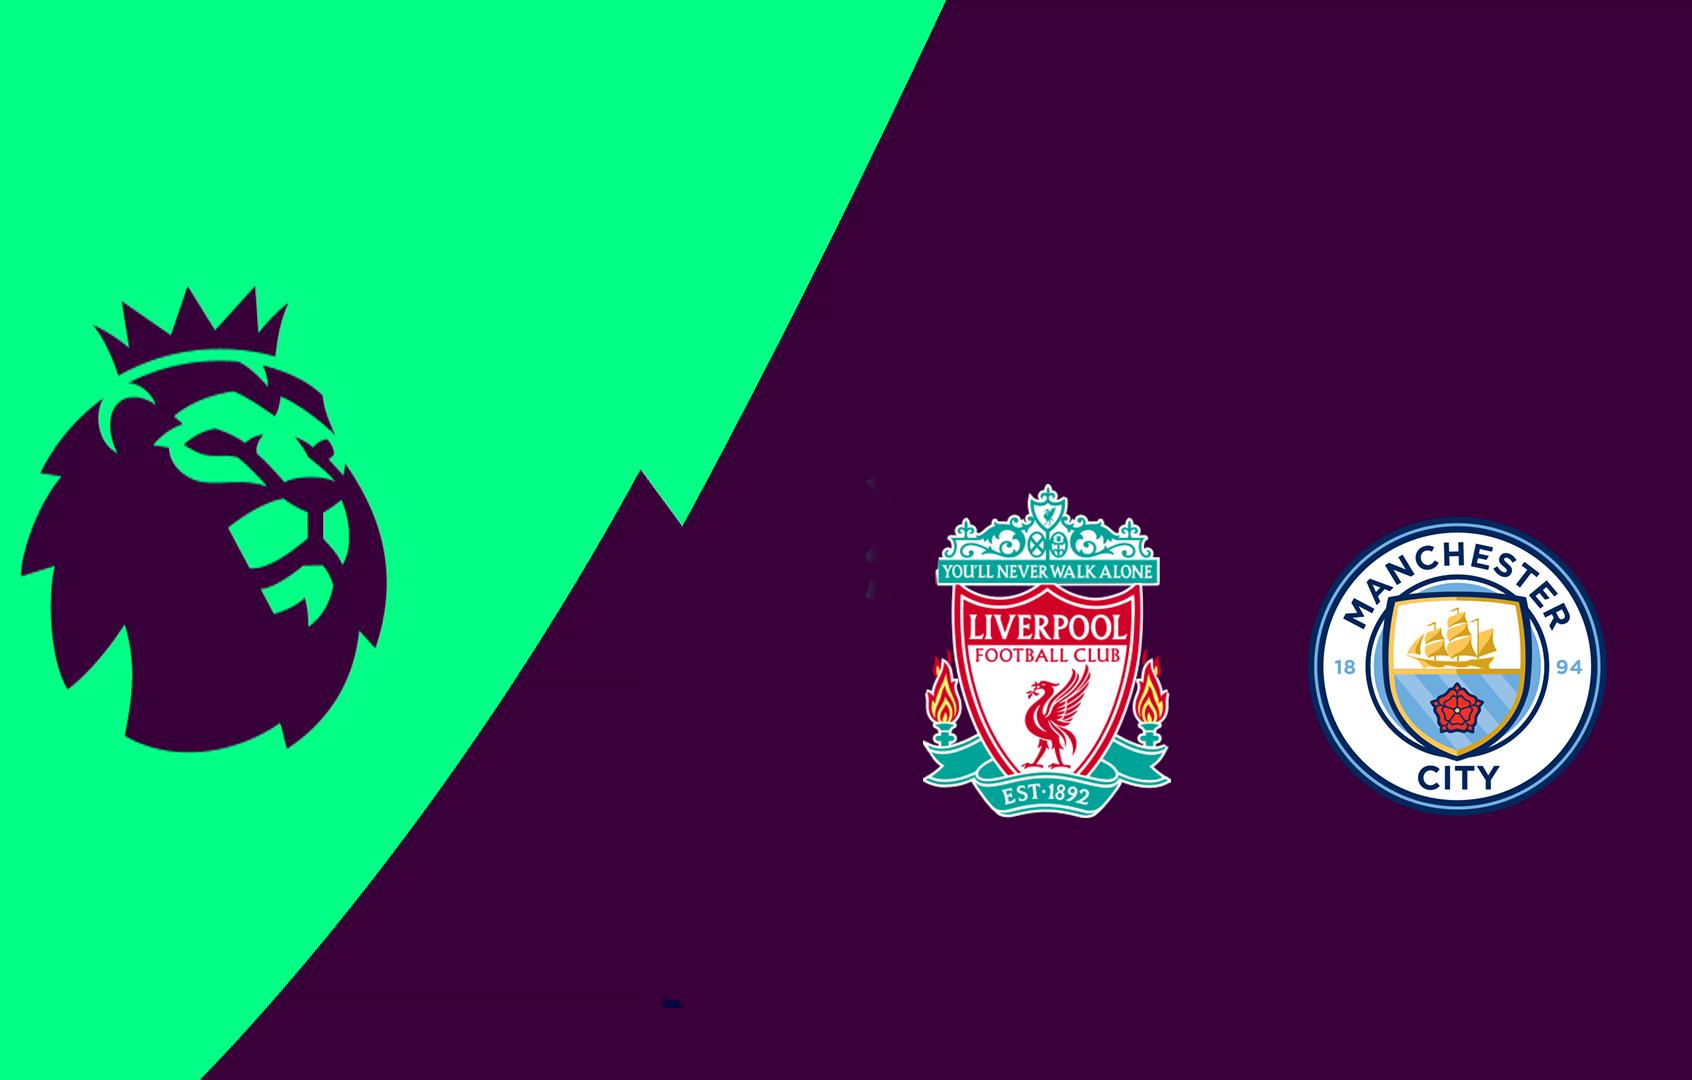 soi-keo-ca-cuoc-bong-da-ngay-7-11-Liverpool-vs-club-brugge-lay-ve-di-tiep-b9 1